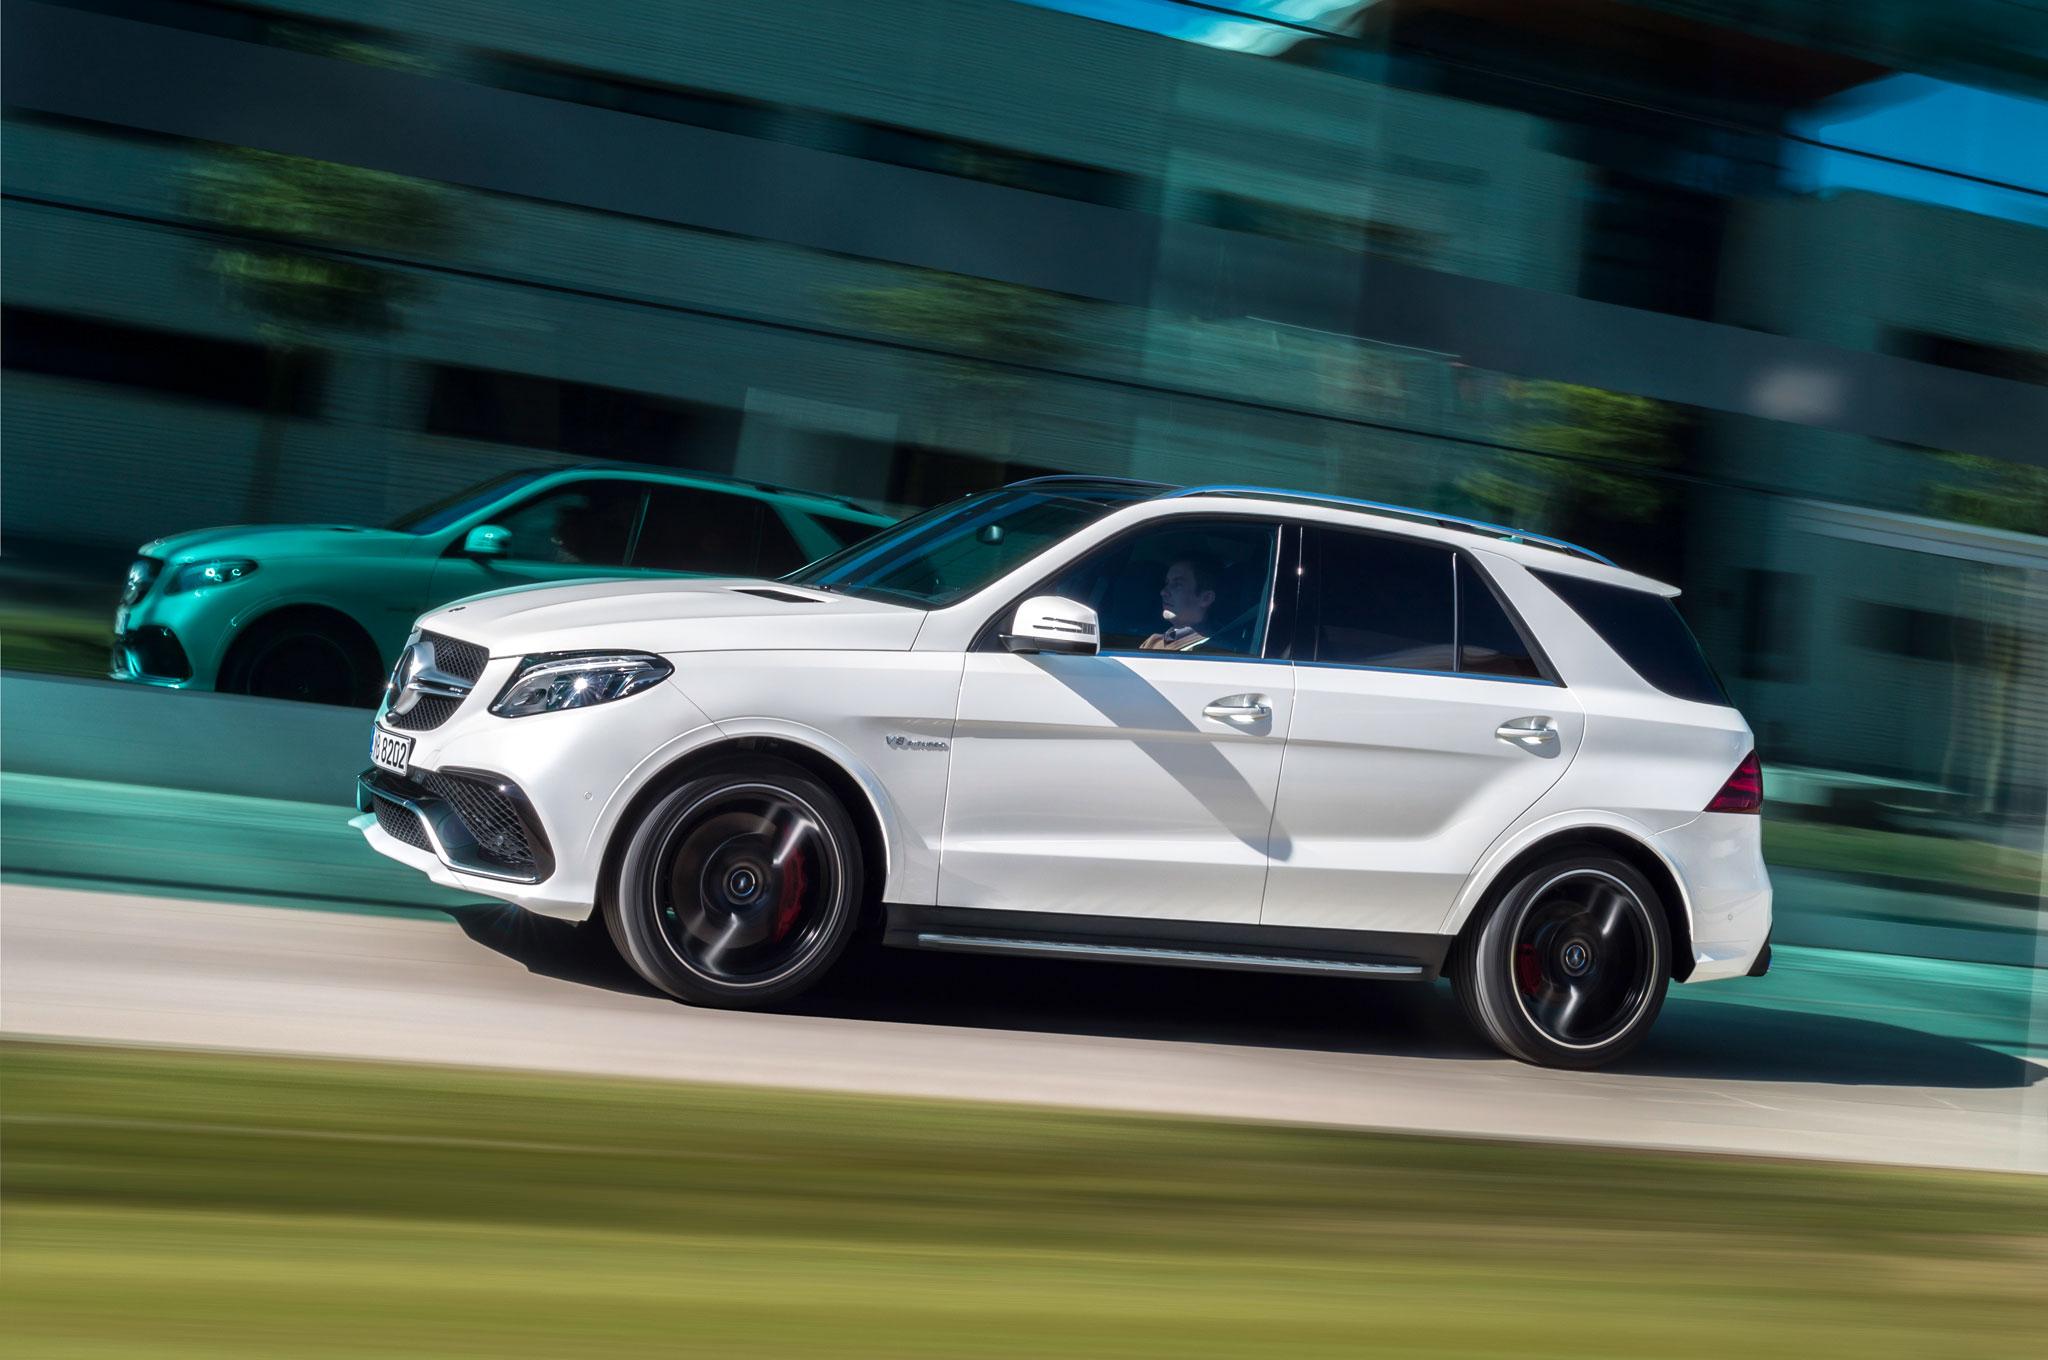 http://st.automobilemag.com/uploads/sites/11/2015/03/2016-Mercedes-Benz-GLE63-AMG-S-side-in-motion-02.jpg